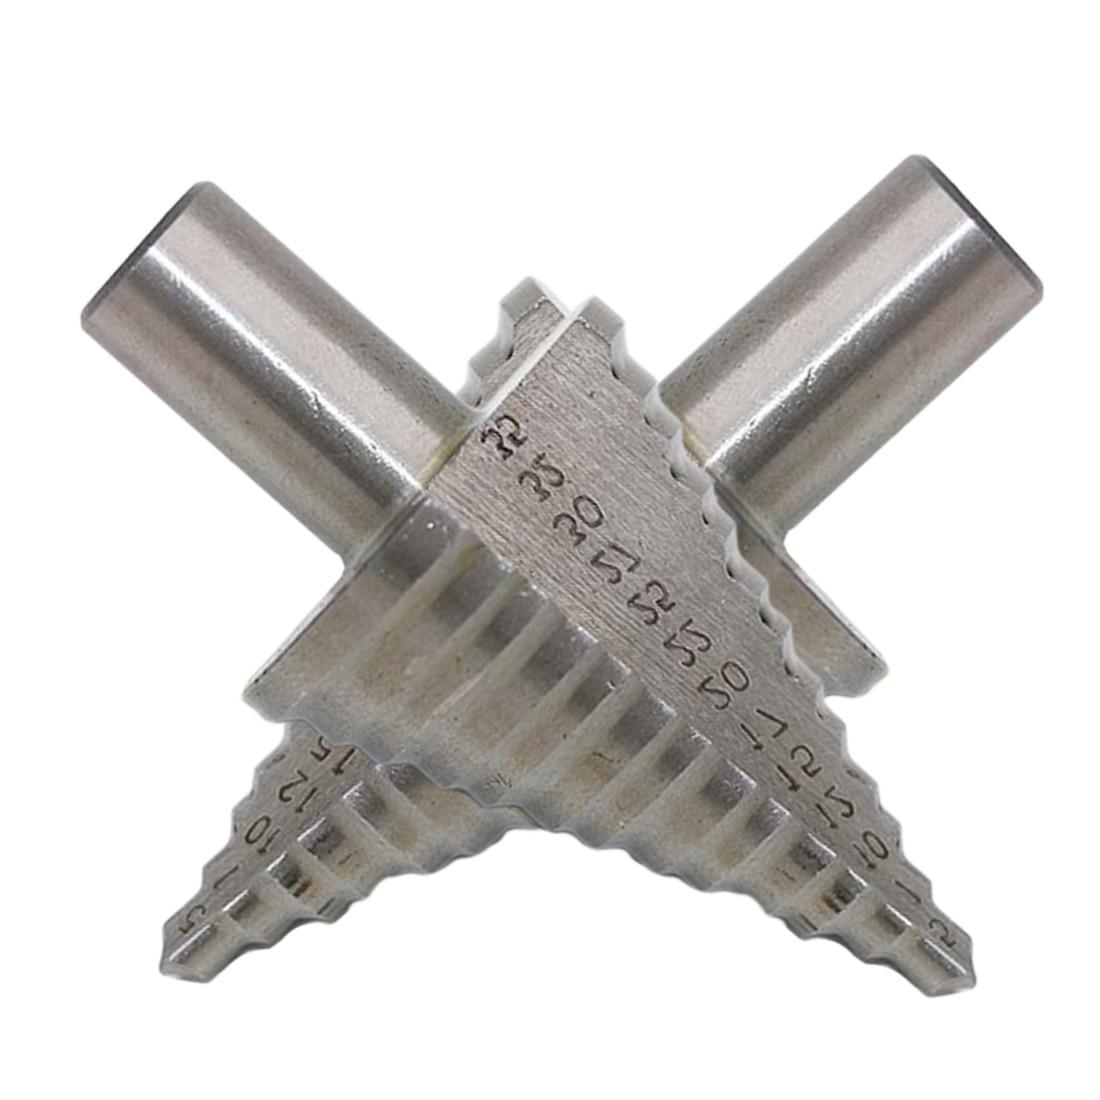 Metal Drilling Tool 5-35MM 13 Steps(5,7,10,12,15,17,20,22,25,27,30,32,35MM) Step Drill Bit HSS Cobalt Reamer Multiple Hole Tool